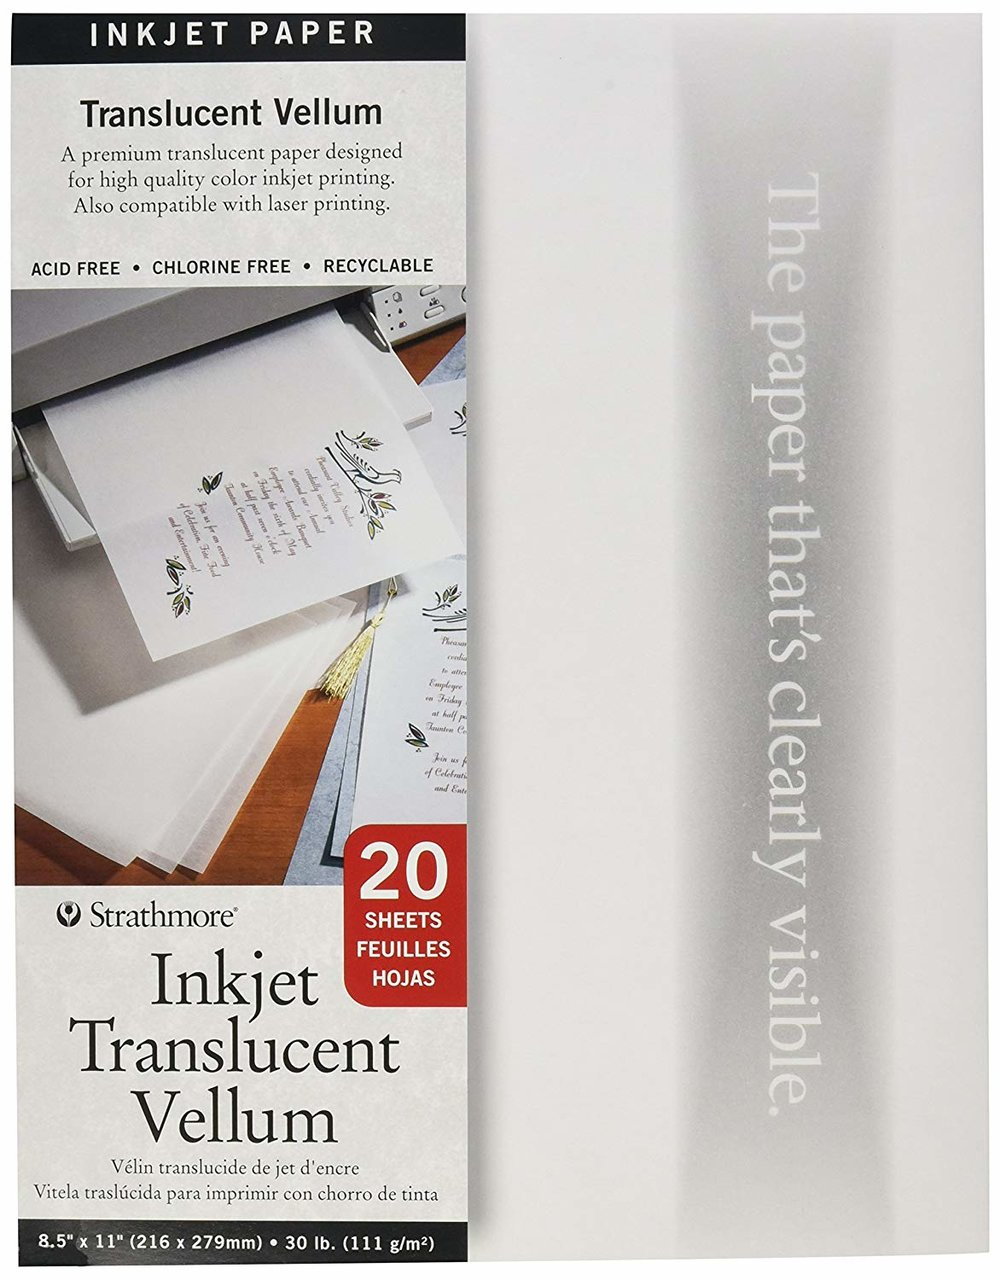 Inkjet Translucent Vellum